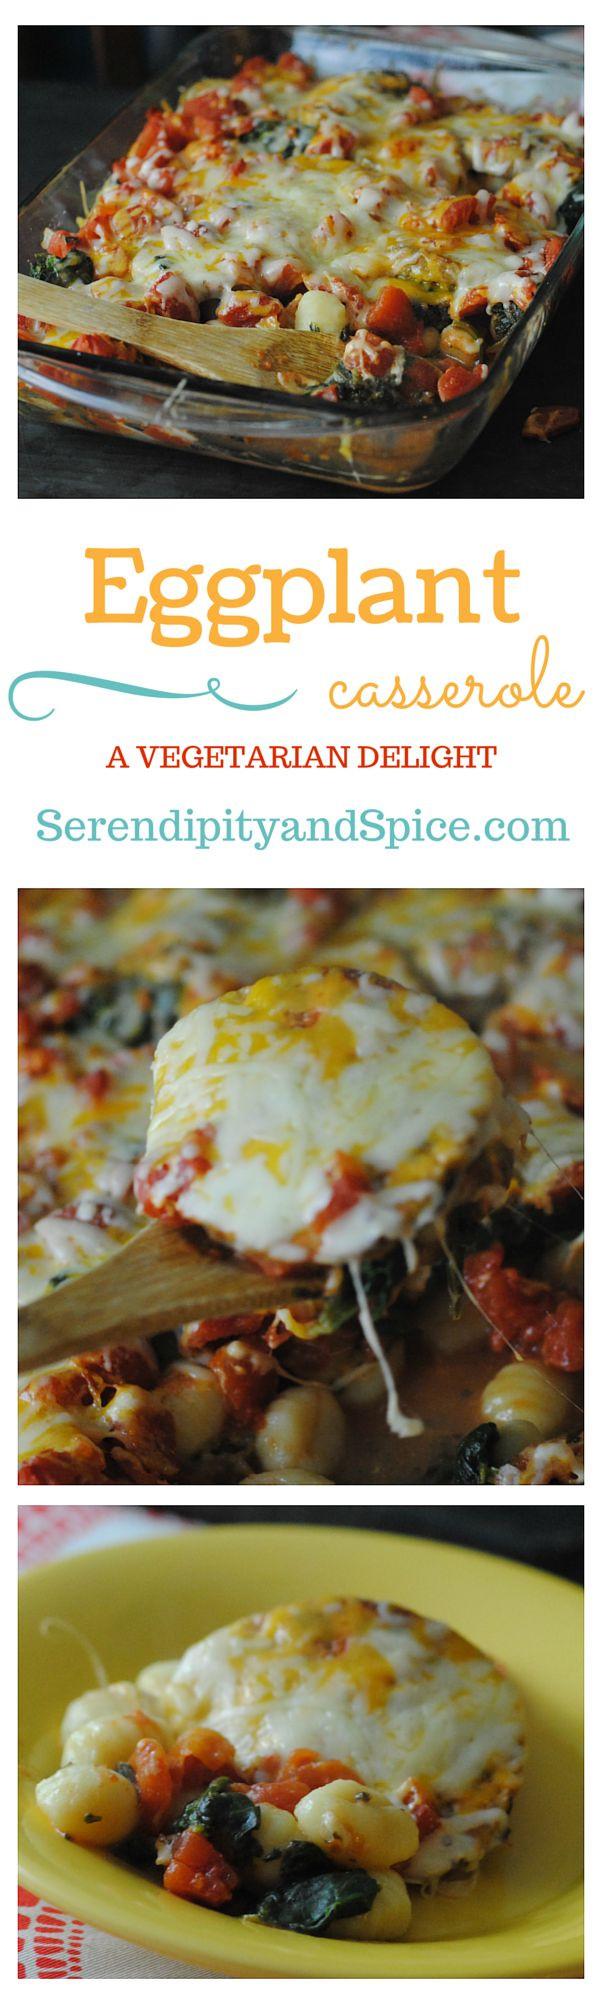 Healthy Eggplant Recipes  Ve arian Healthy Eggplant Casserole Recipe